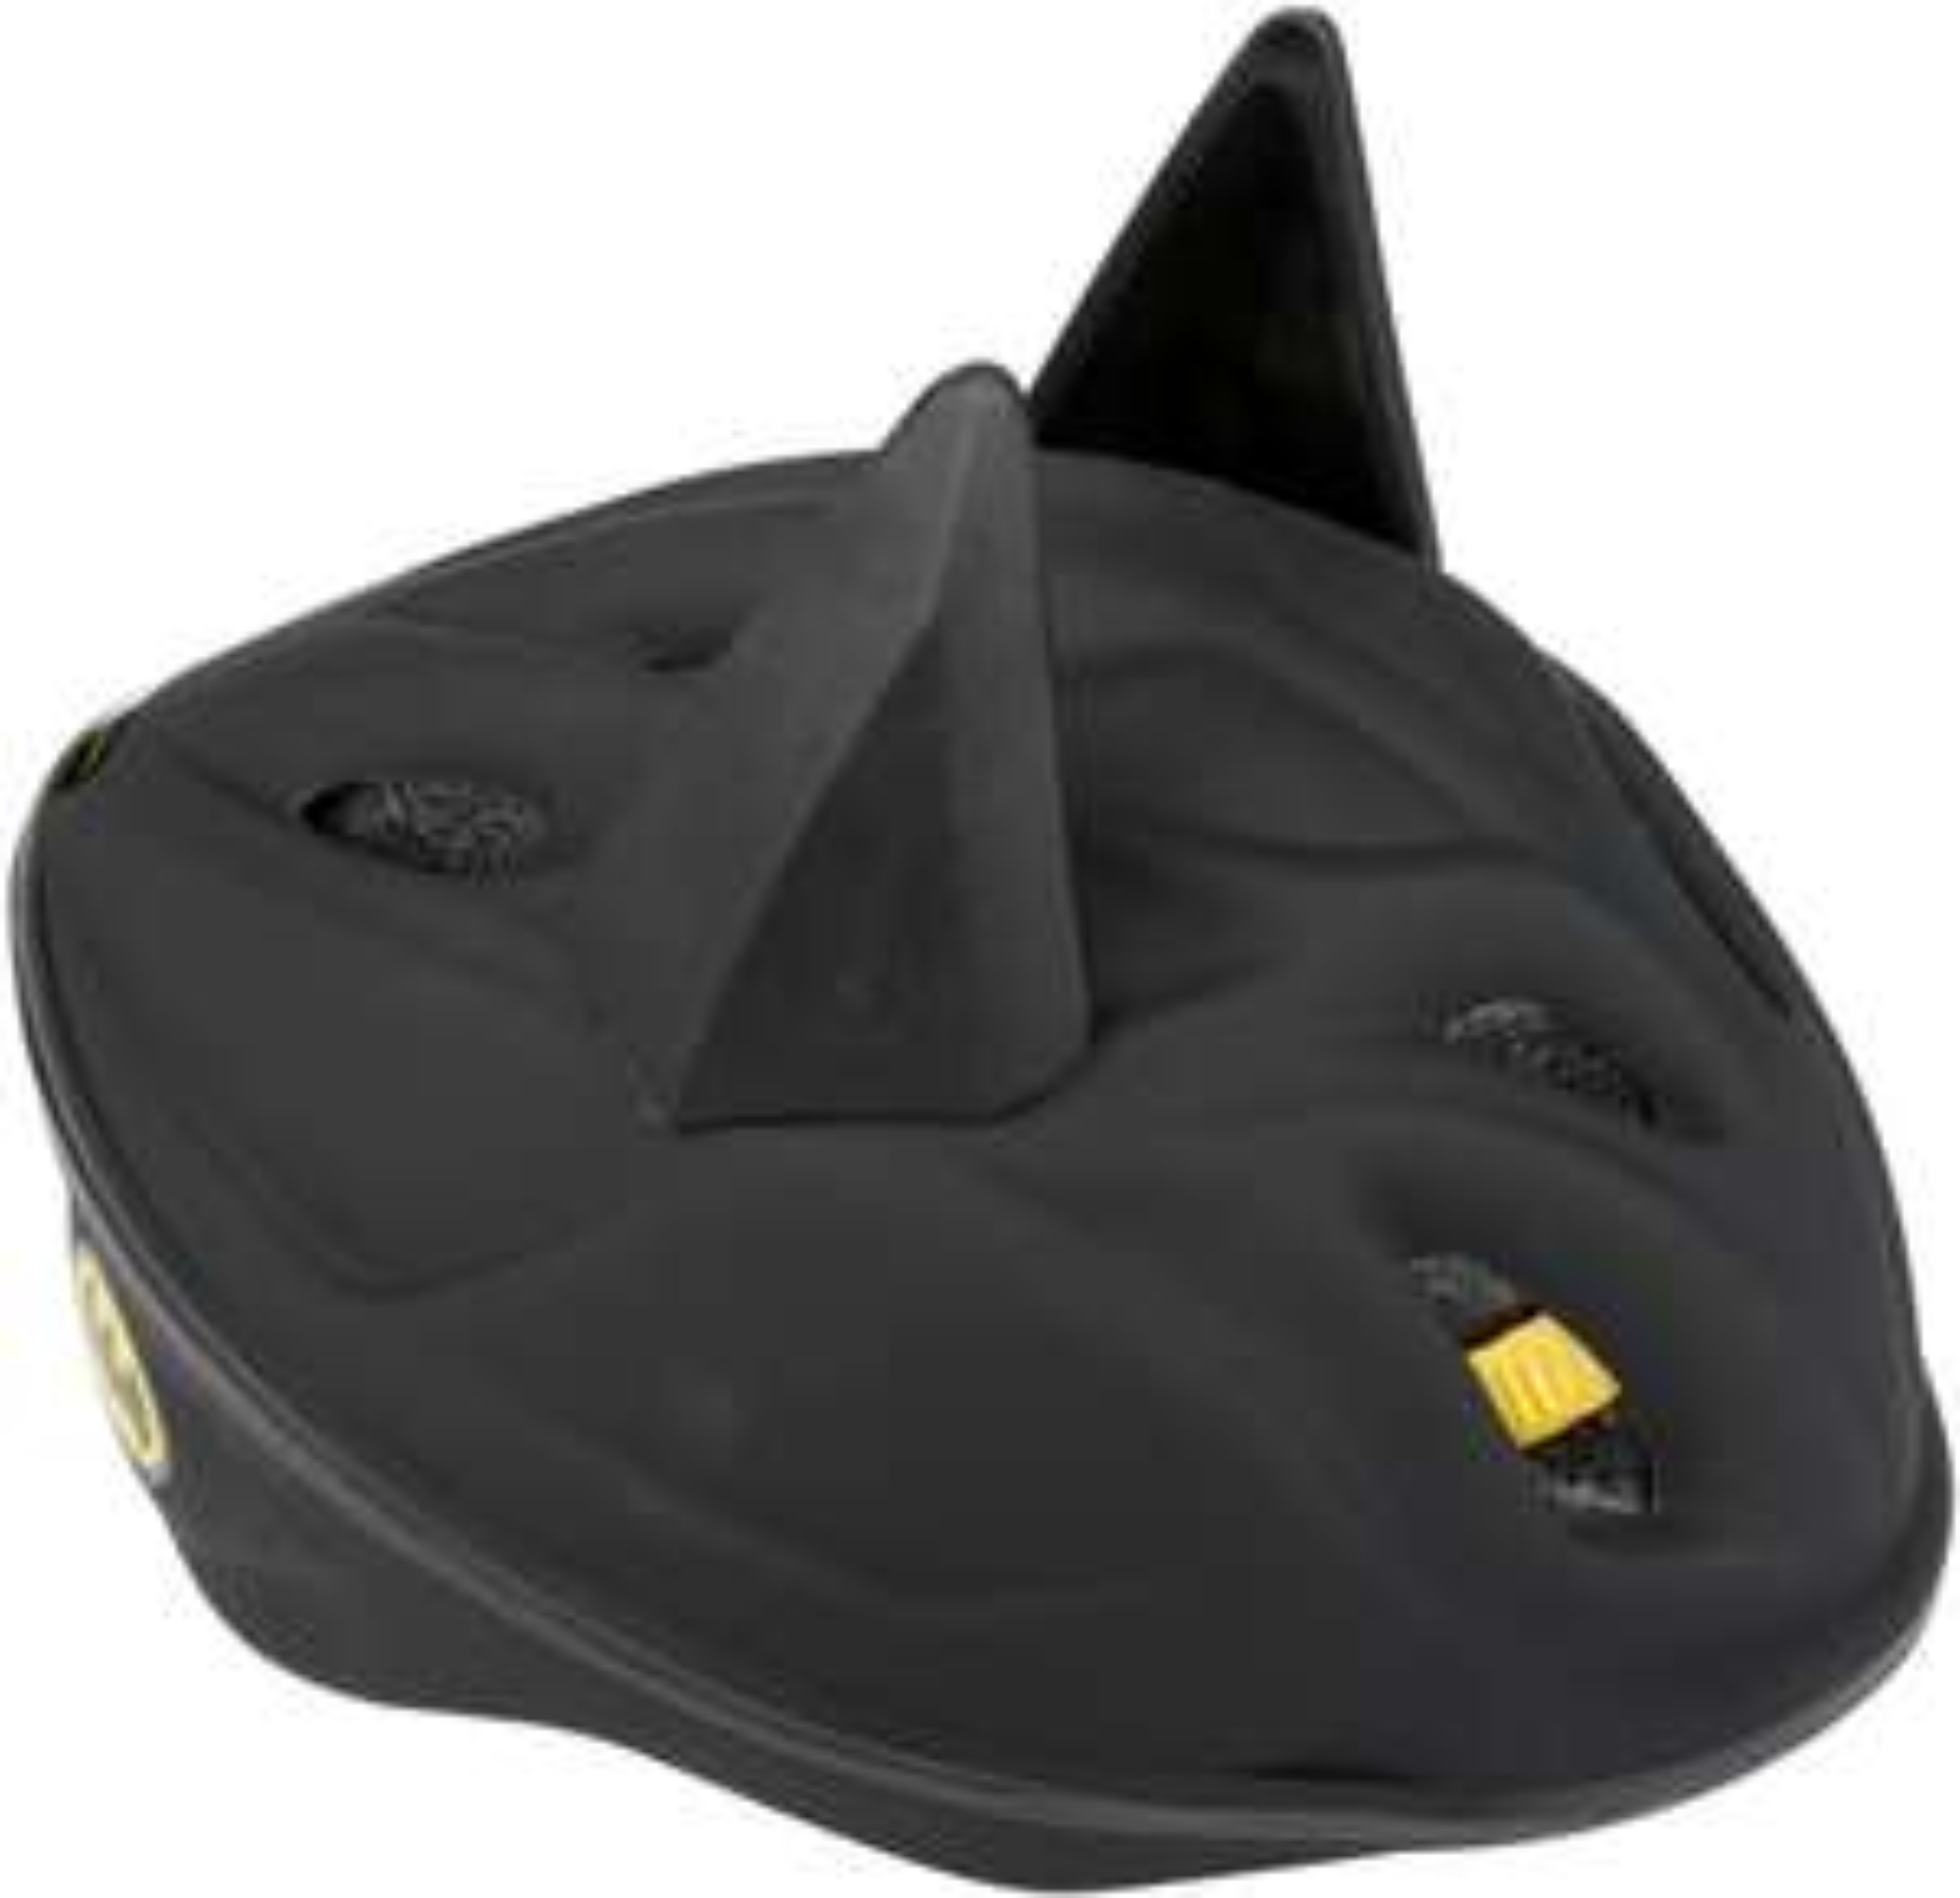 Batman 3D Bat Helmet 53-56cm - £7 @ Halford (Free C&C)